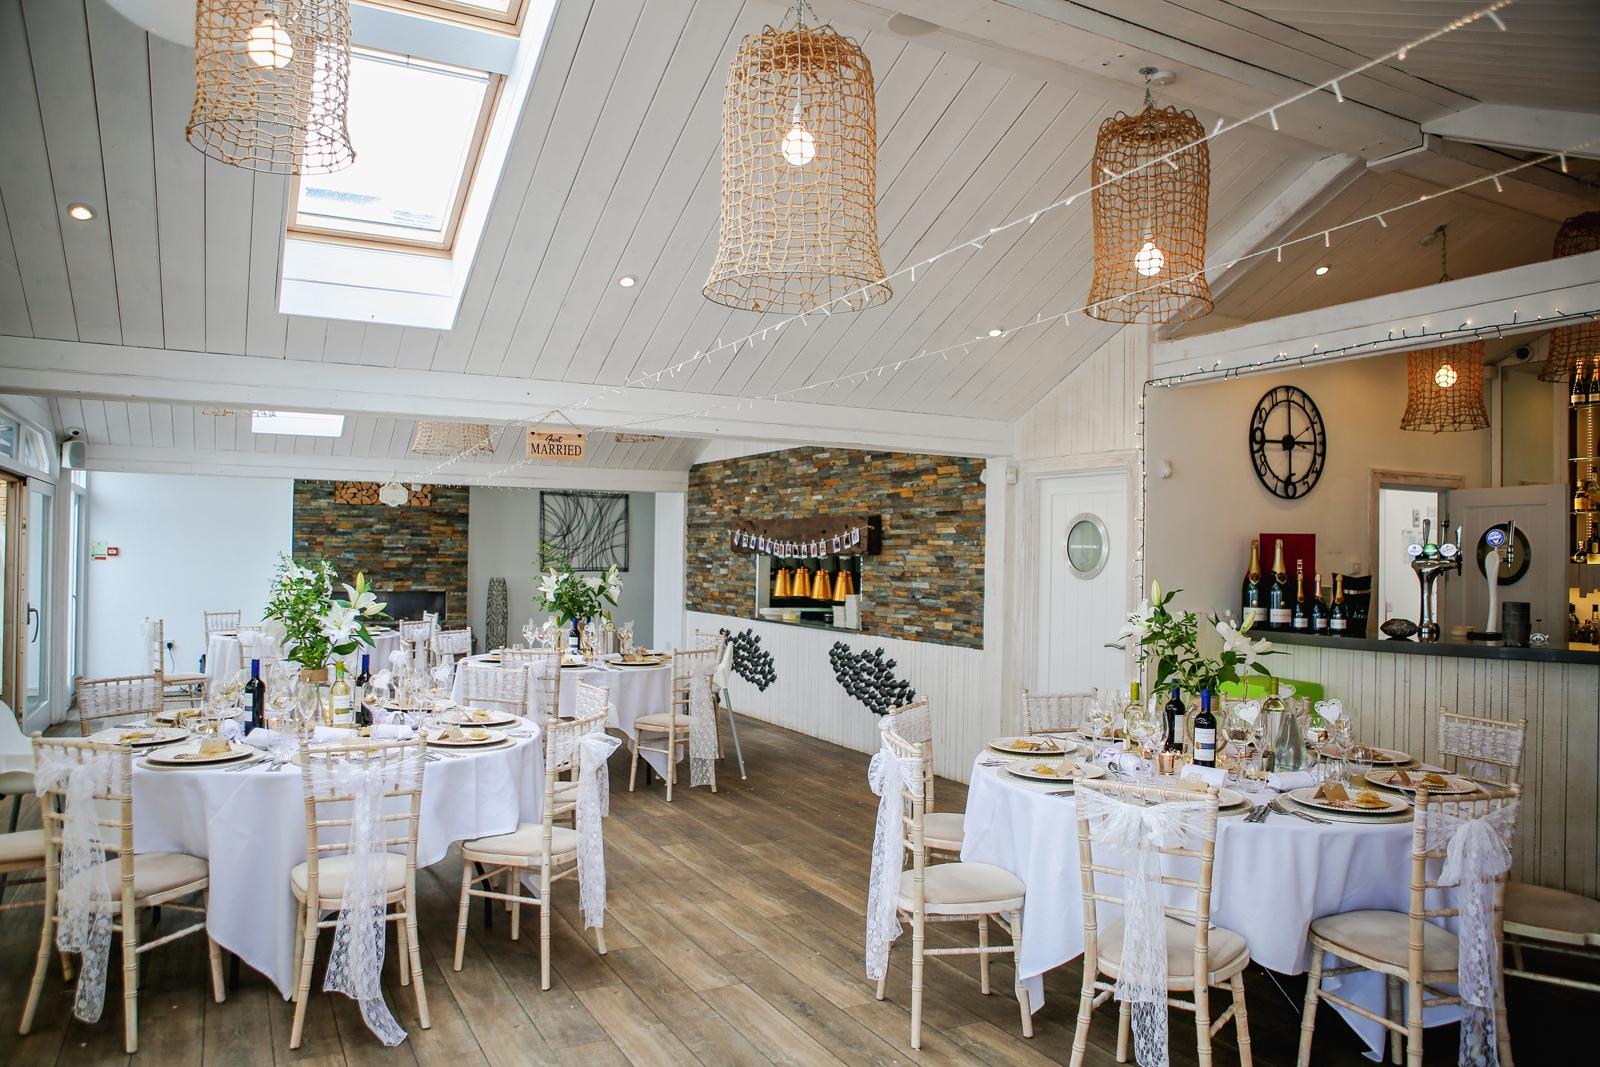 Wedding party seating under skylight window.